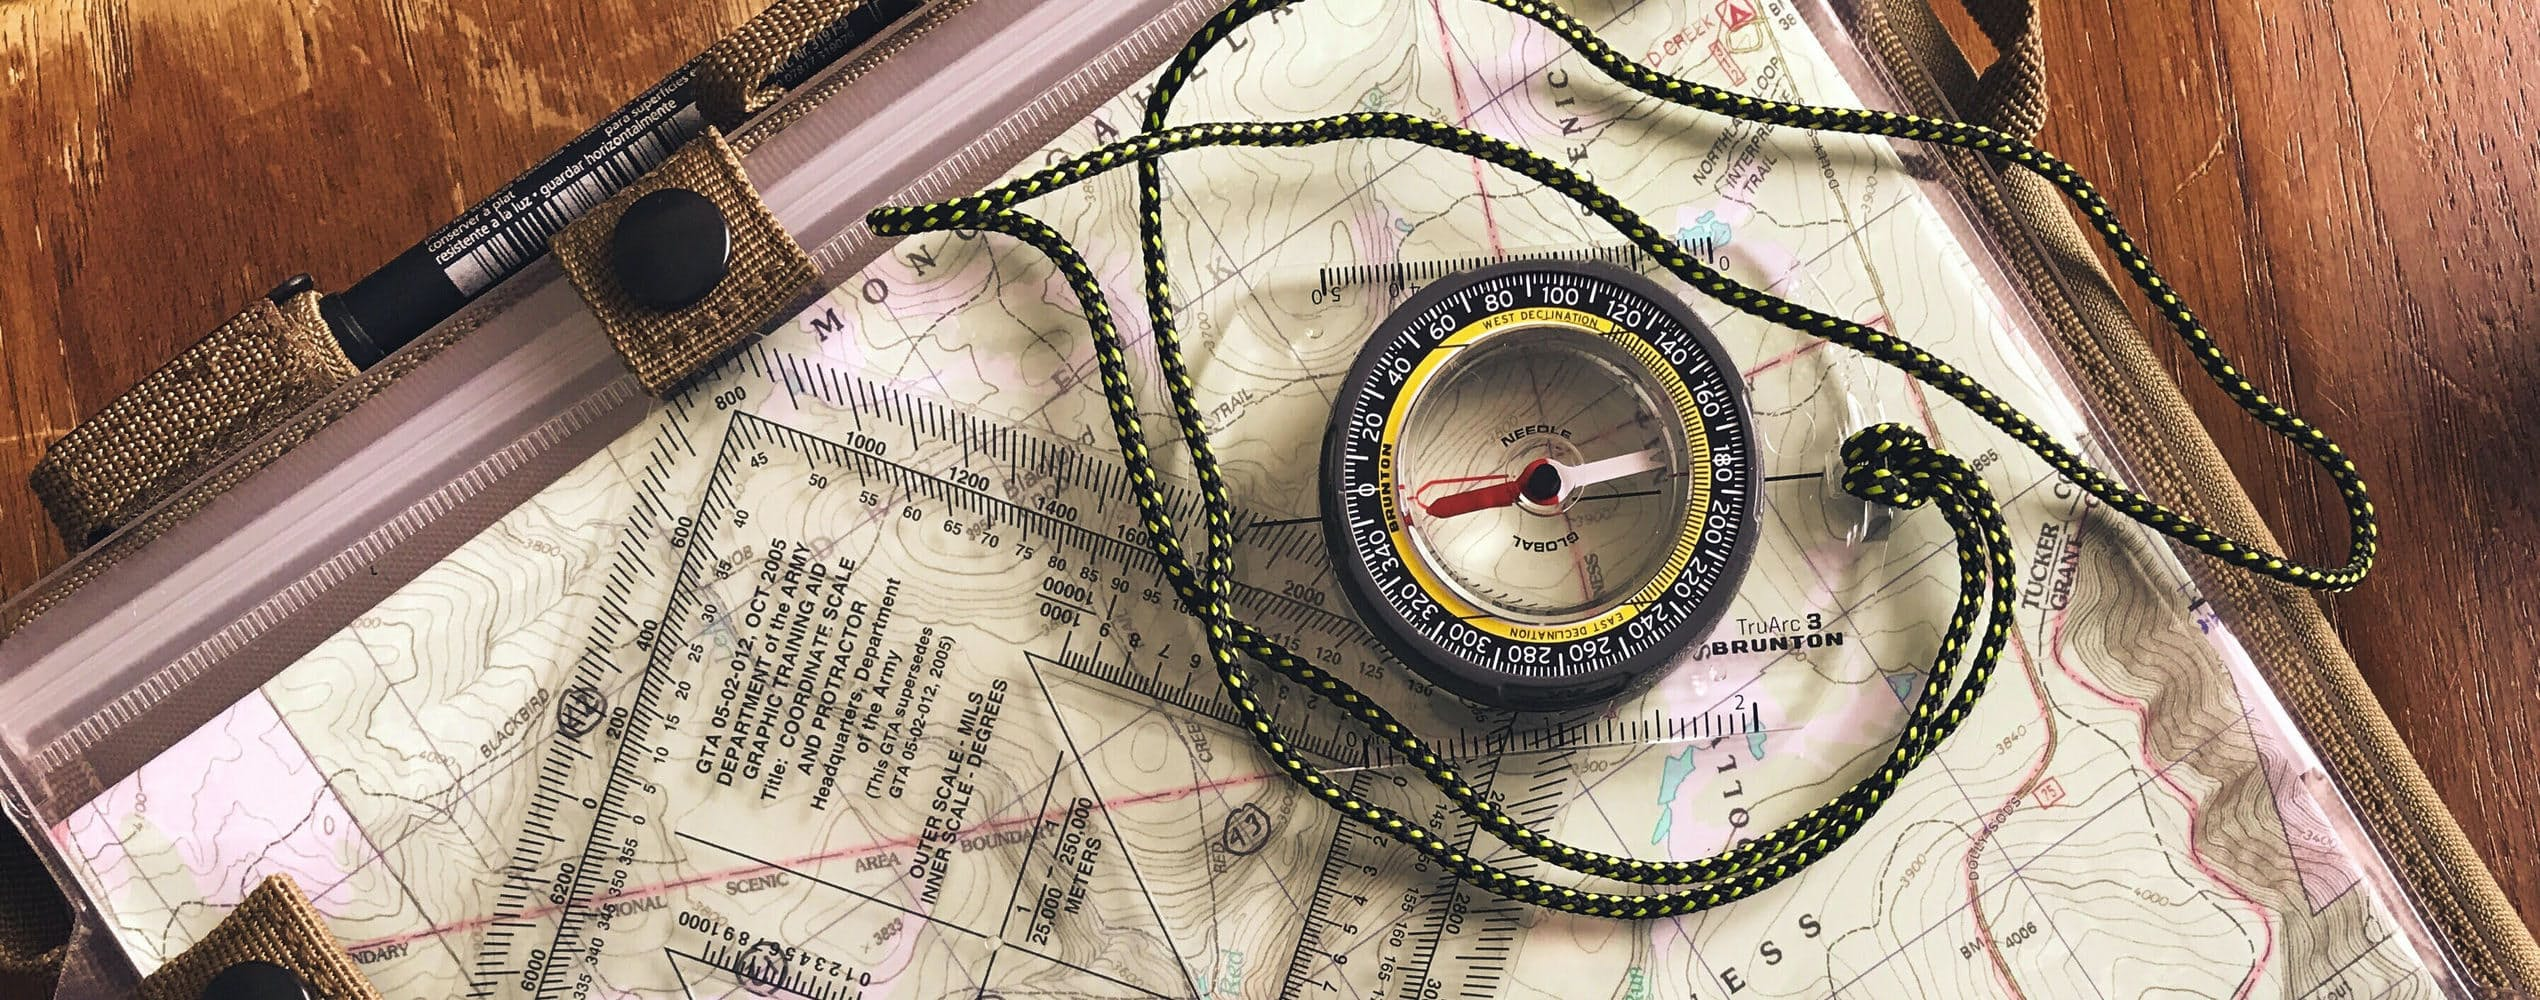 Featured 2x land navigation map banner photo.jpg?ixlib=rails 2.1